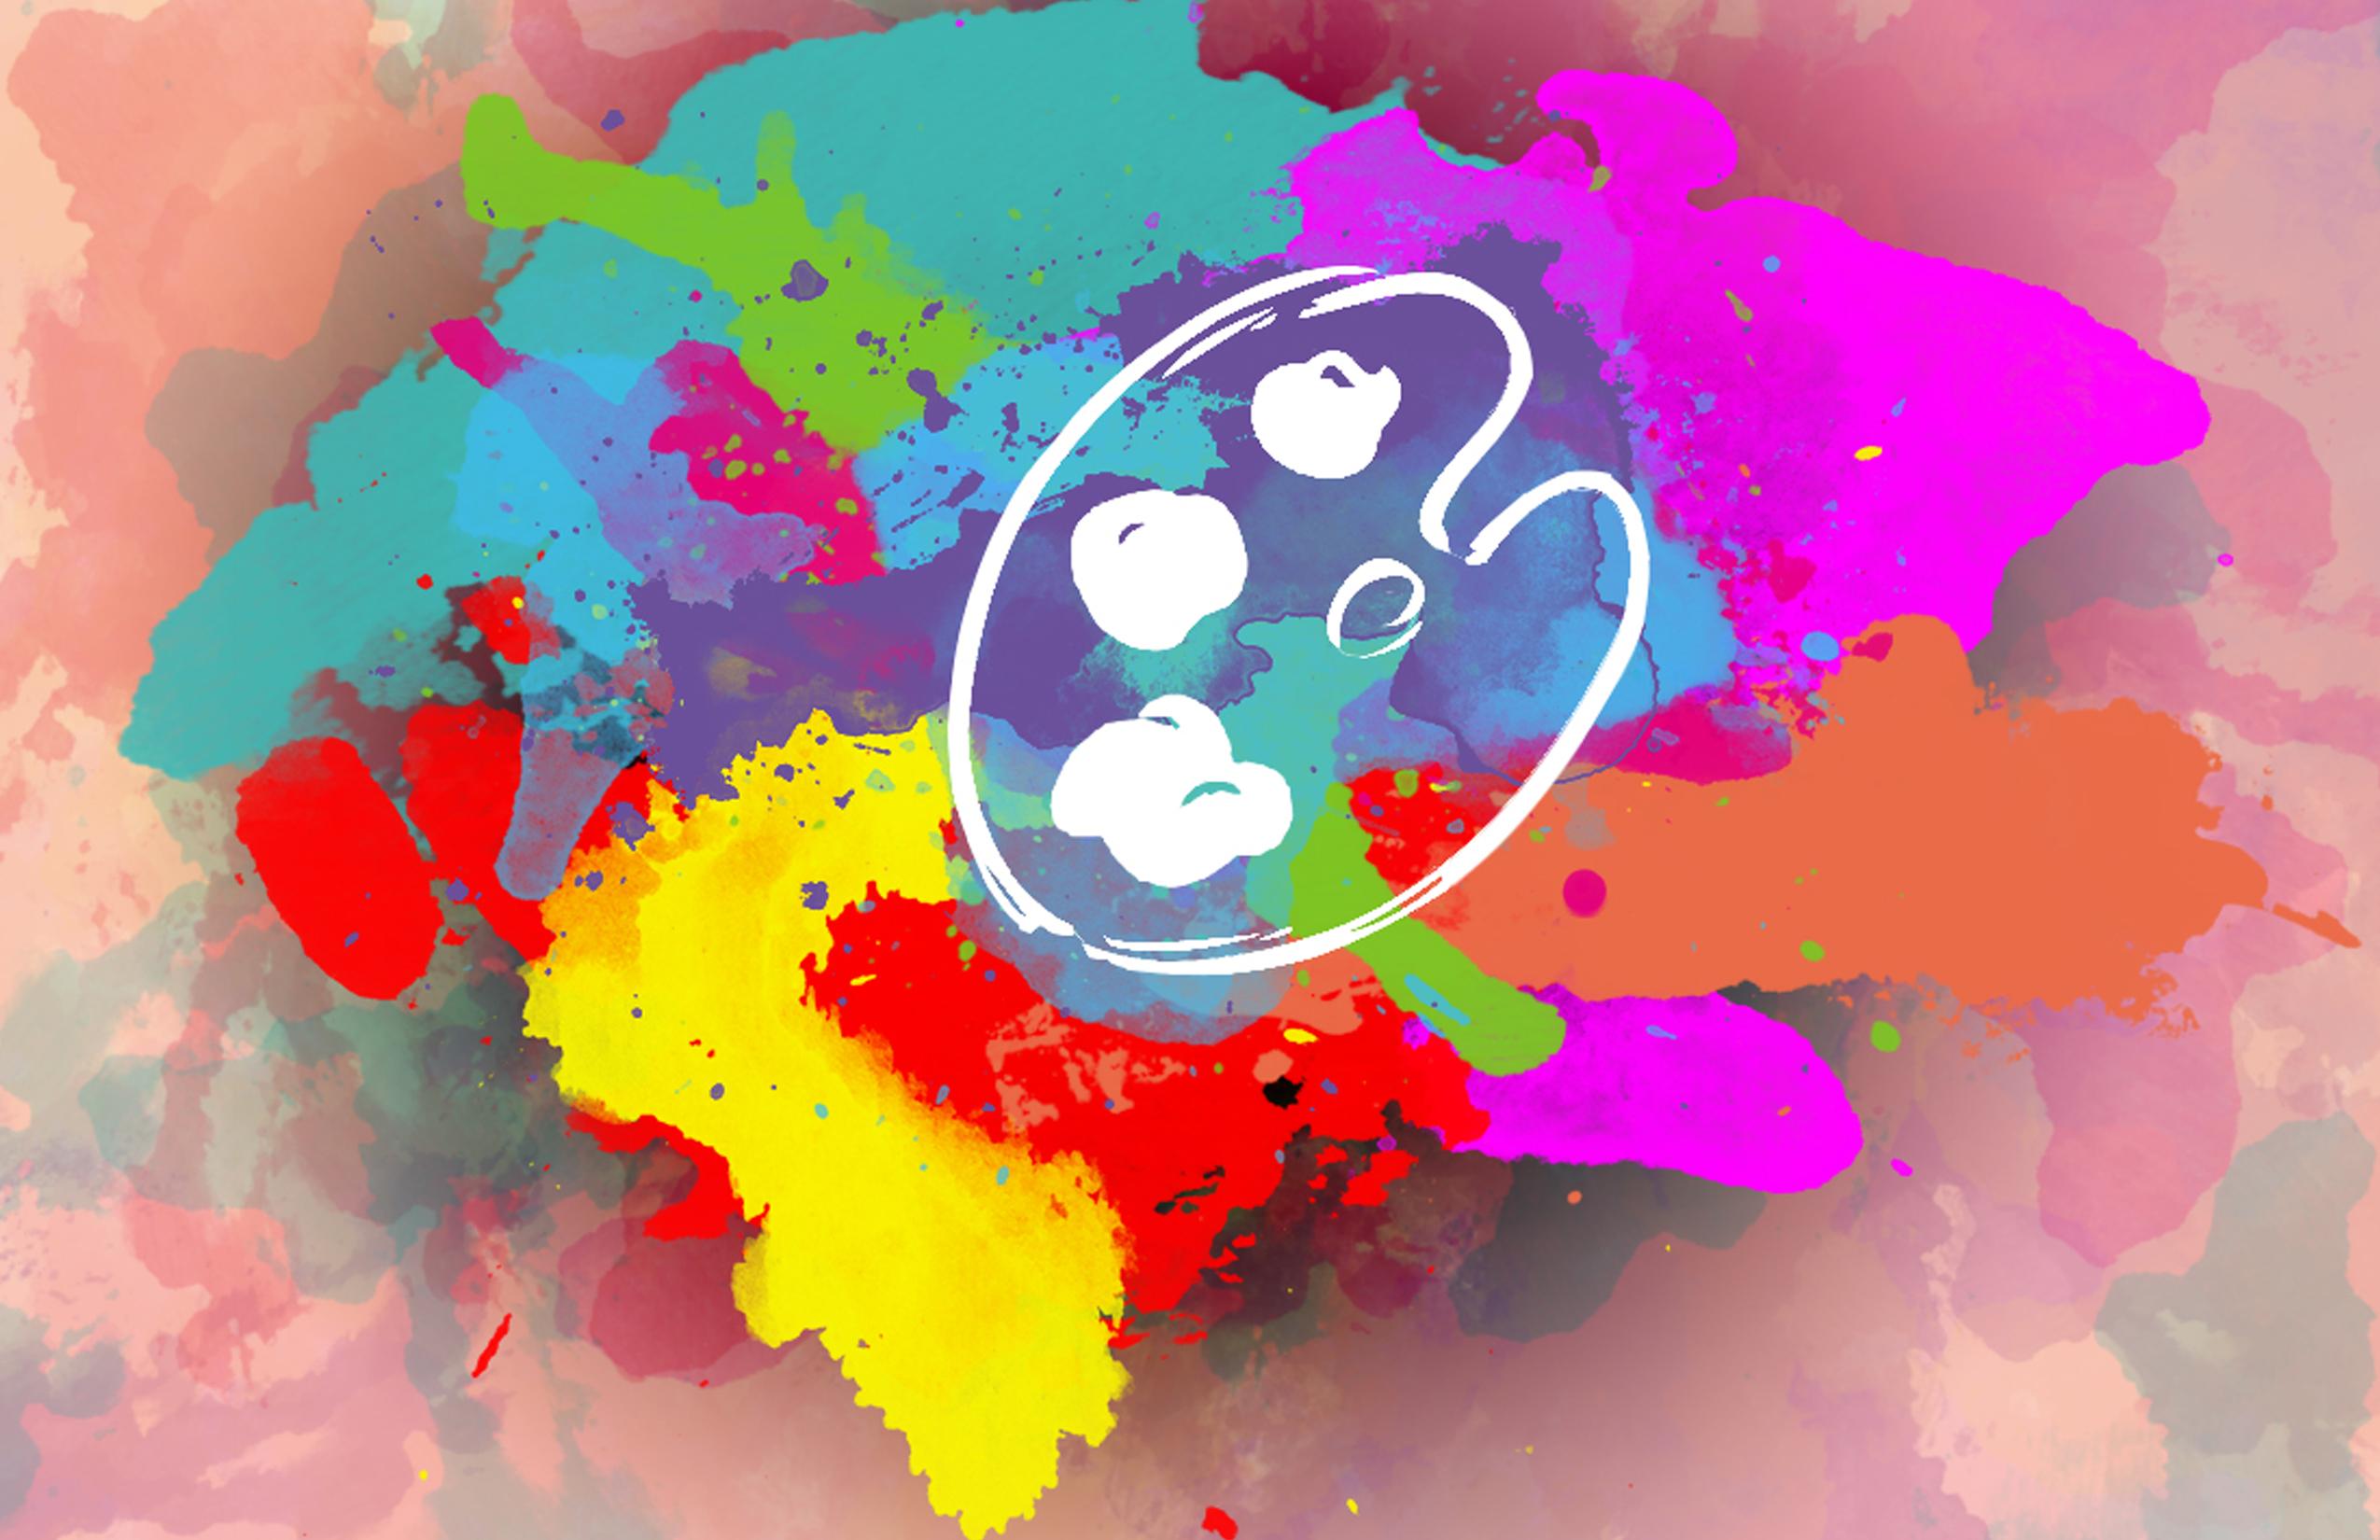 Artistic graphic/Splash page